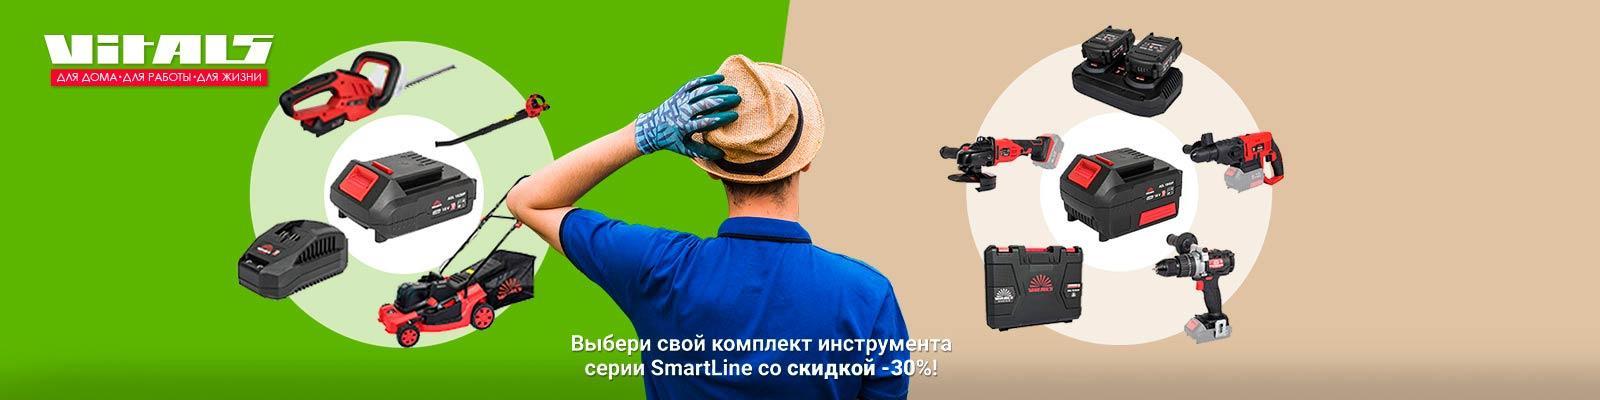 Инструменты Виталс SmartLine